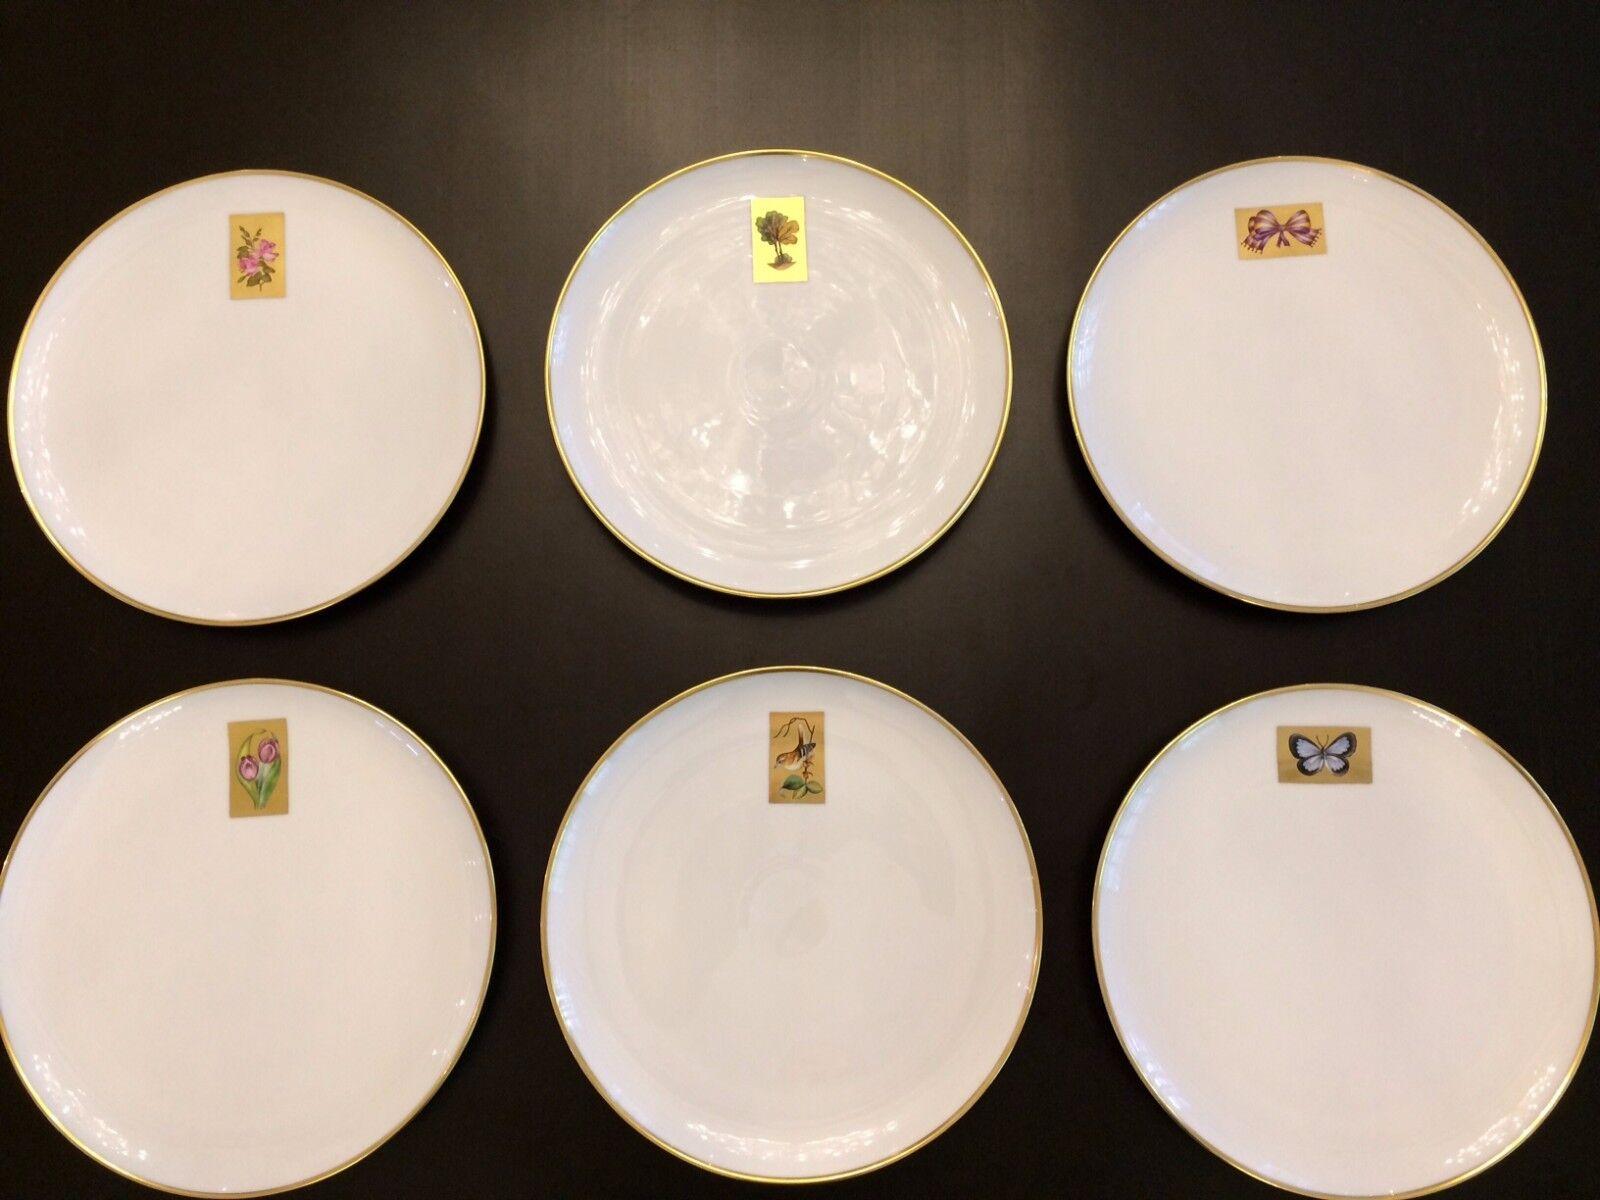 Herend Ungarn Teller handbemalt Rosan Rosan Rosan Goldrand Hermitage Orient Onyx 27 cm | Fairer Preis  c131c6